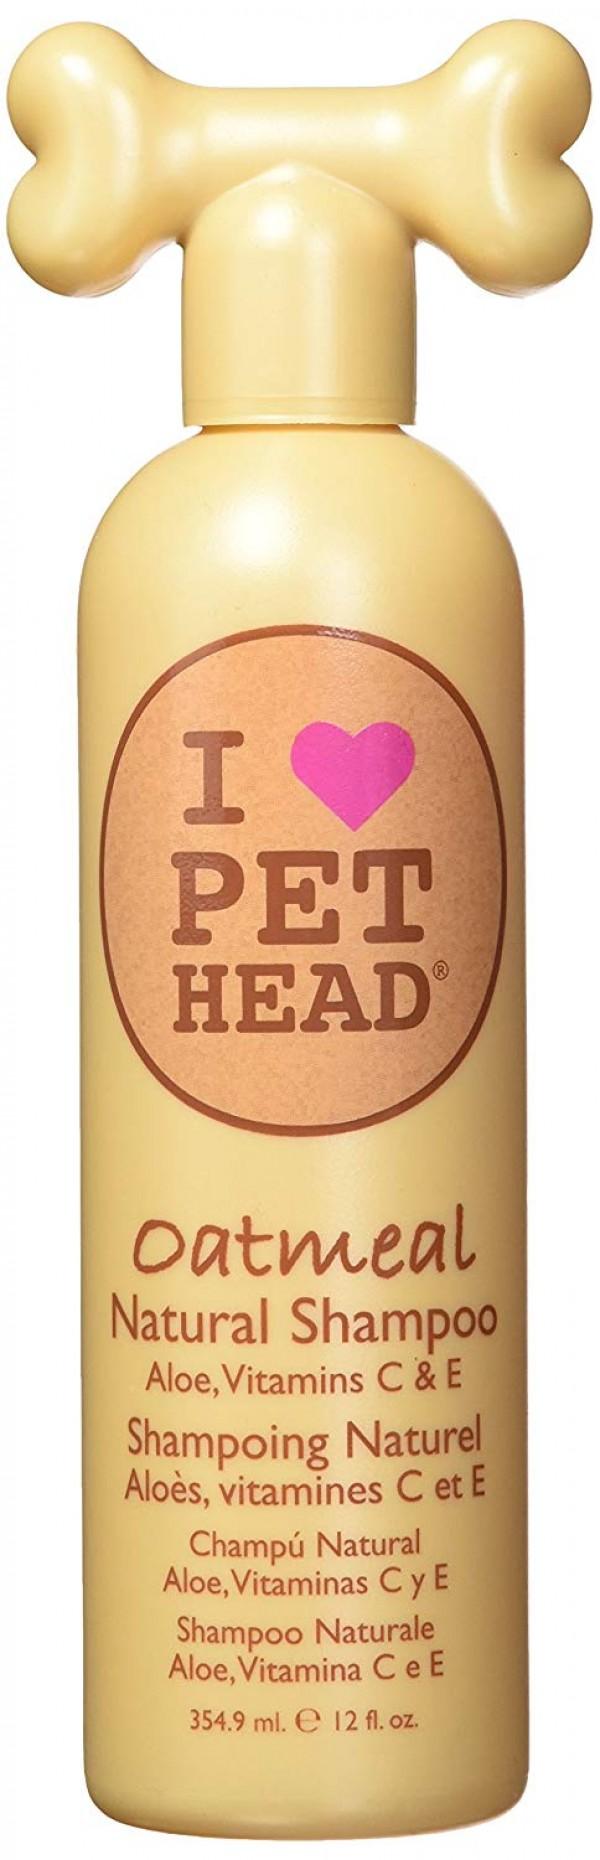 PET HEAD Oatmeal Šampon 354ml